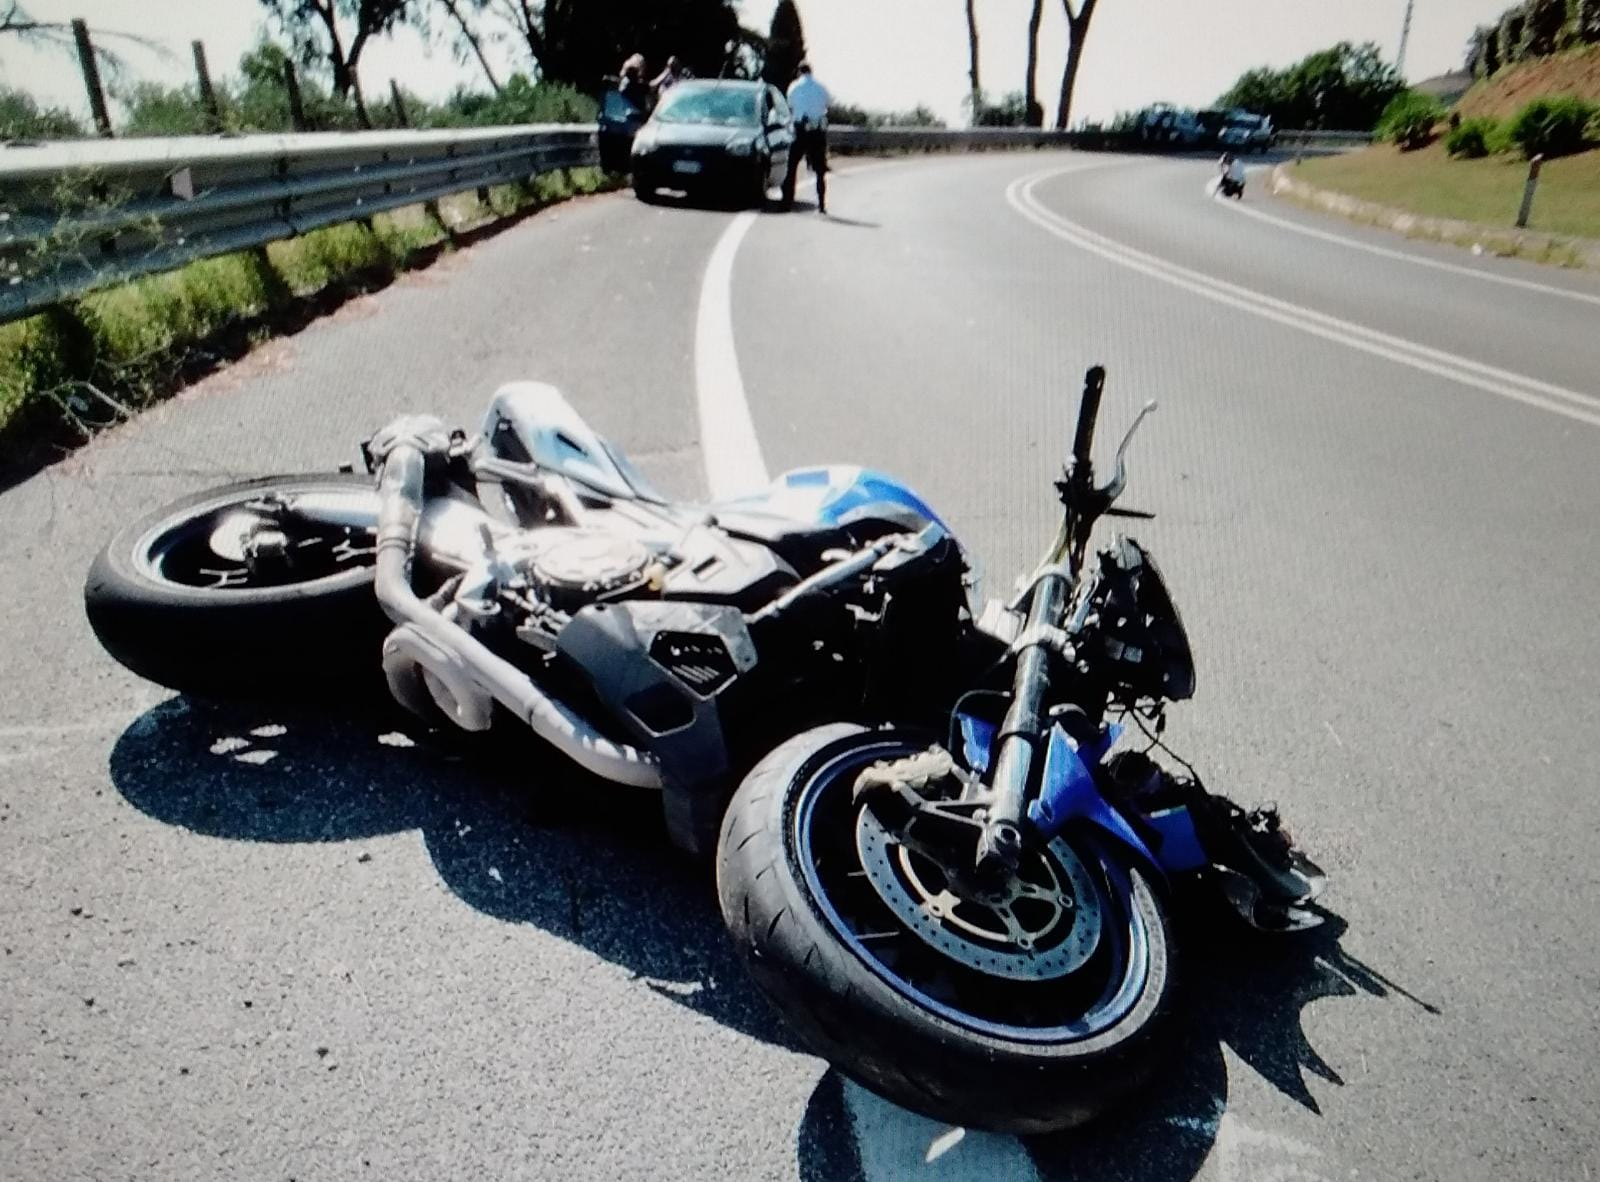 ostia-incidente-moto-bici